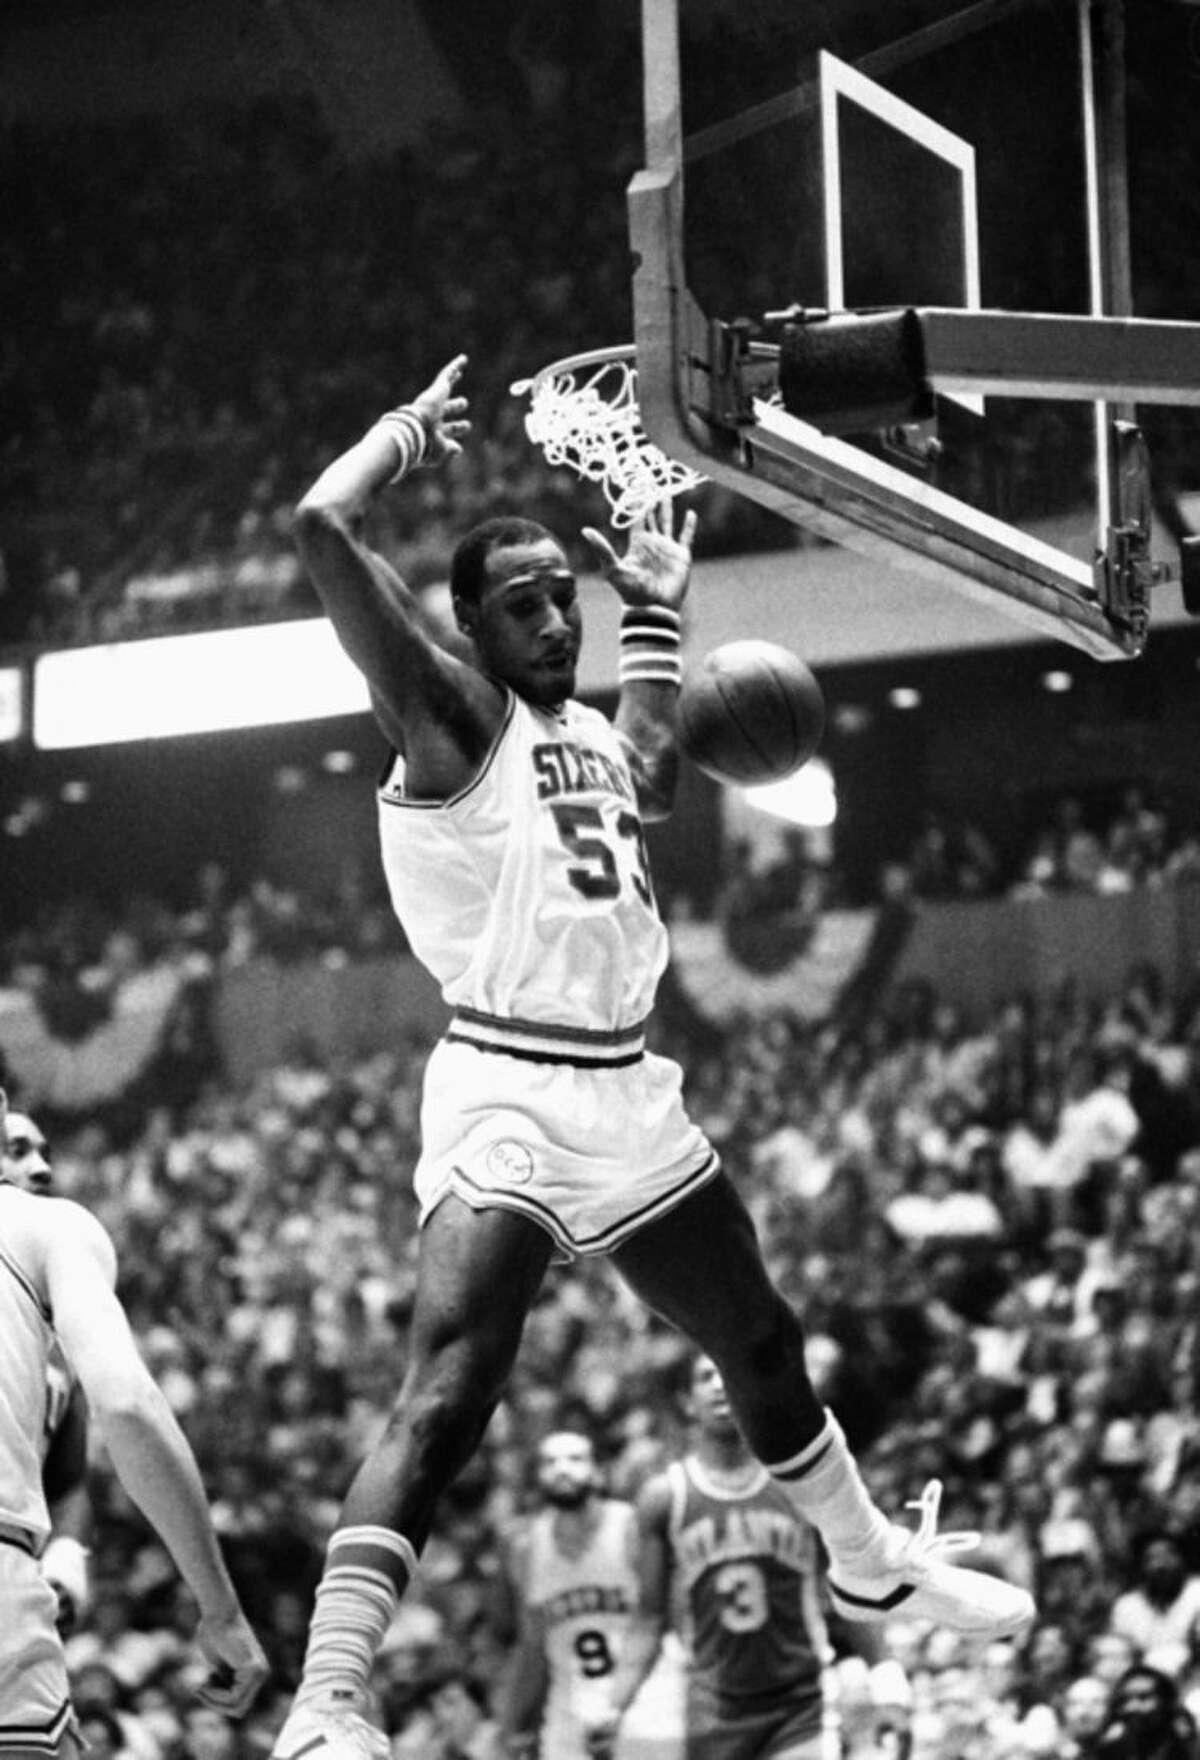 FILE - In this April 15, 1980, file photo, Philadelphia 76ers' Darryl Dawkins dunks against the Atlanta Hawks in an NBA playoff game in Philadelphia. Darryl Dawkins, whose backboard-shattering dunks earned him the moniker